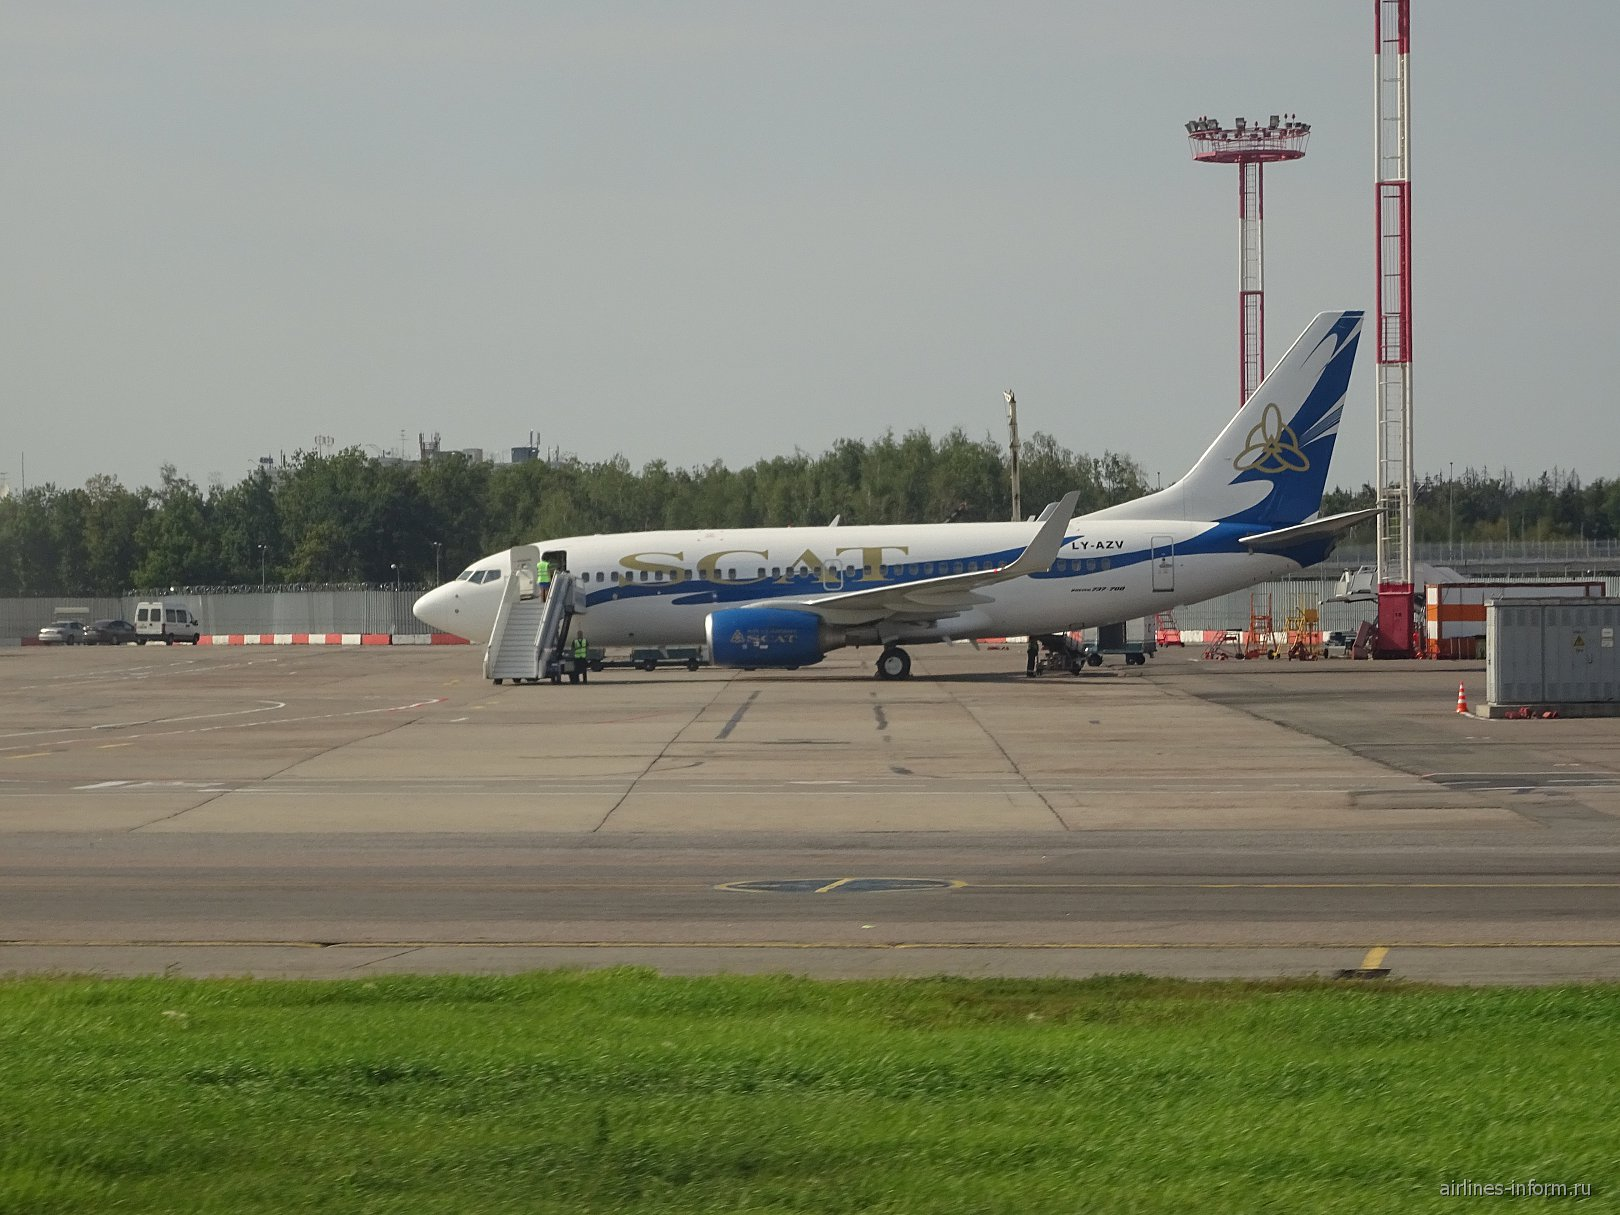 Боинг-737-700 LY-AZV авиакомпании SCAT в аэропорту Домодедово